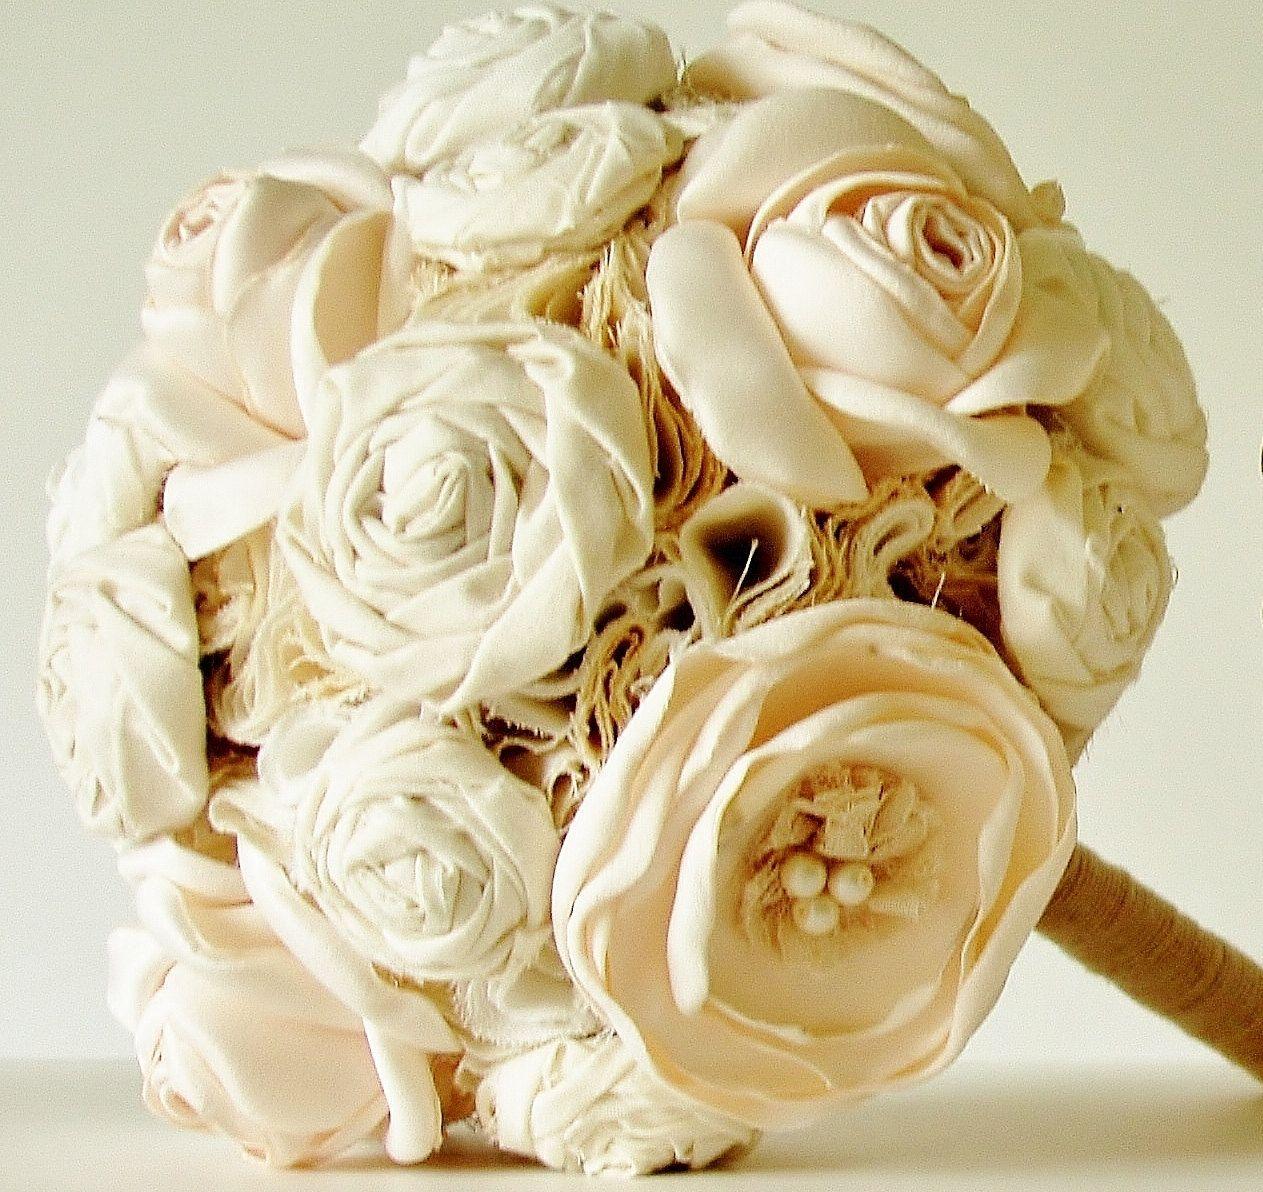 Fabric flower wedding boquet fabric flower bouquet vintage bridal fabric flower wedding boquet fabric flower bouquet vintage bridal bouquet by bouquets4love izmirmasajfo